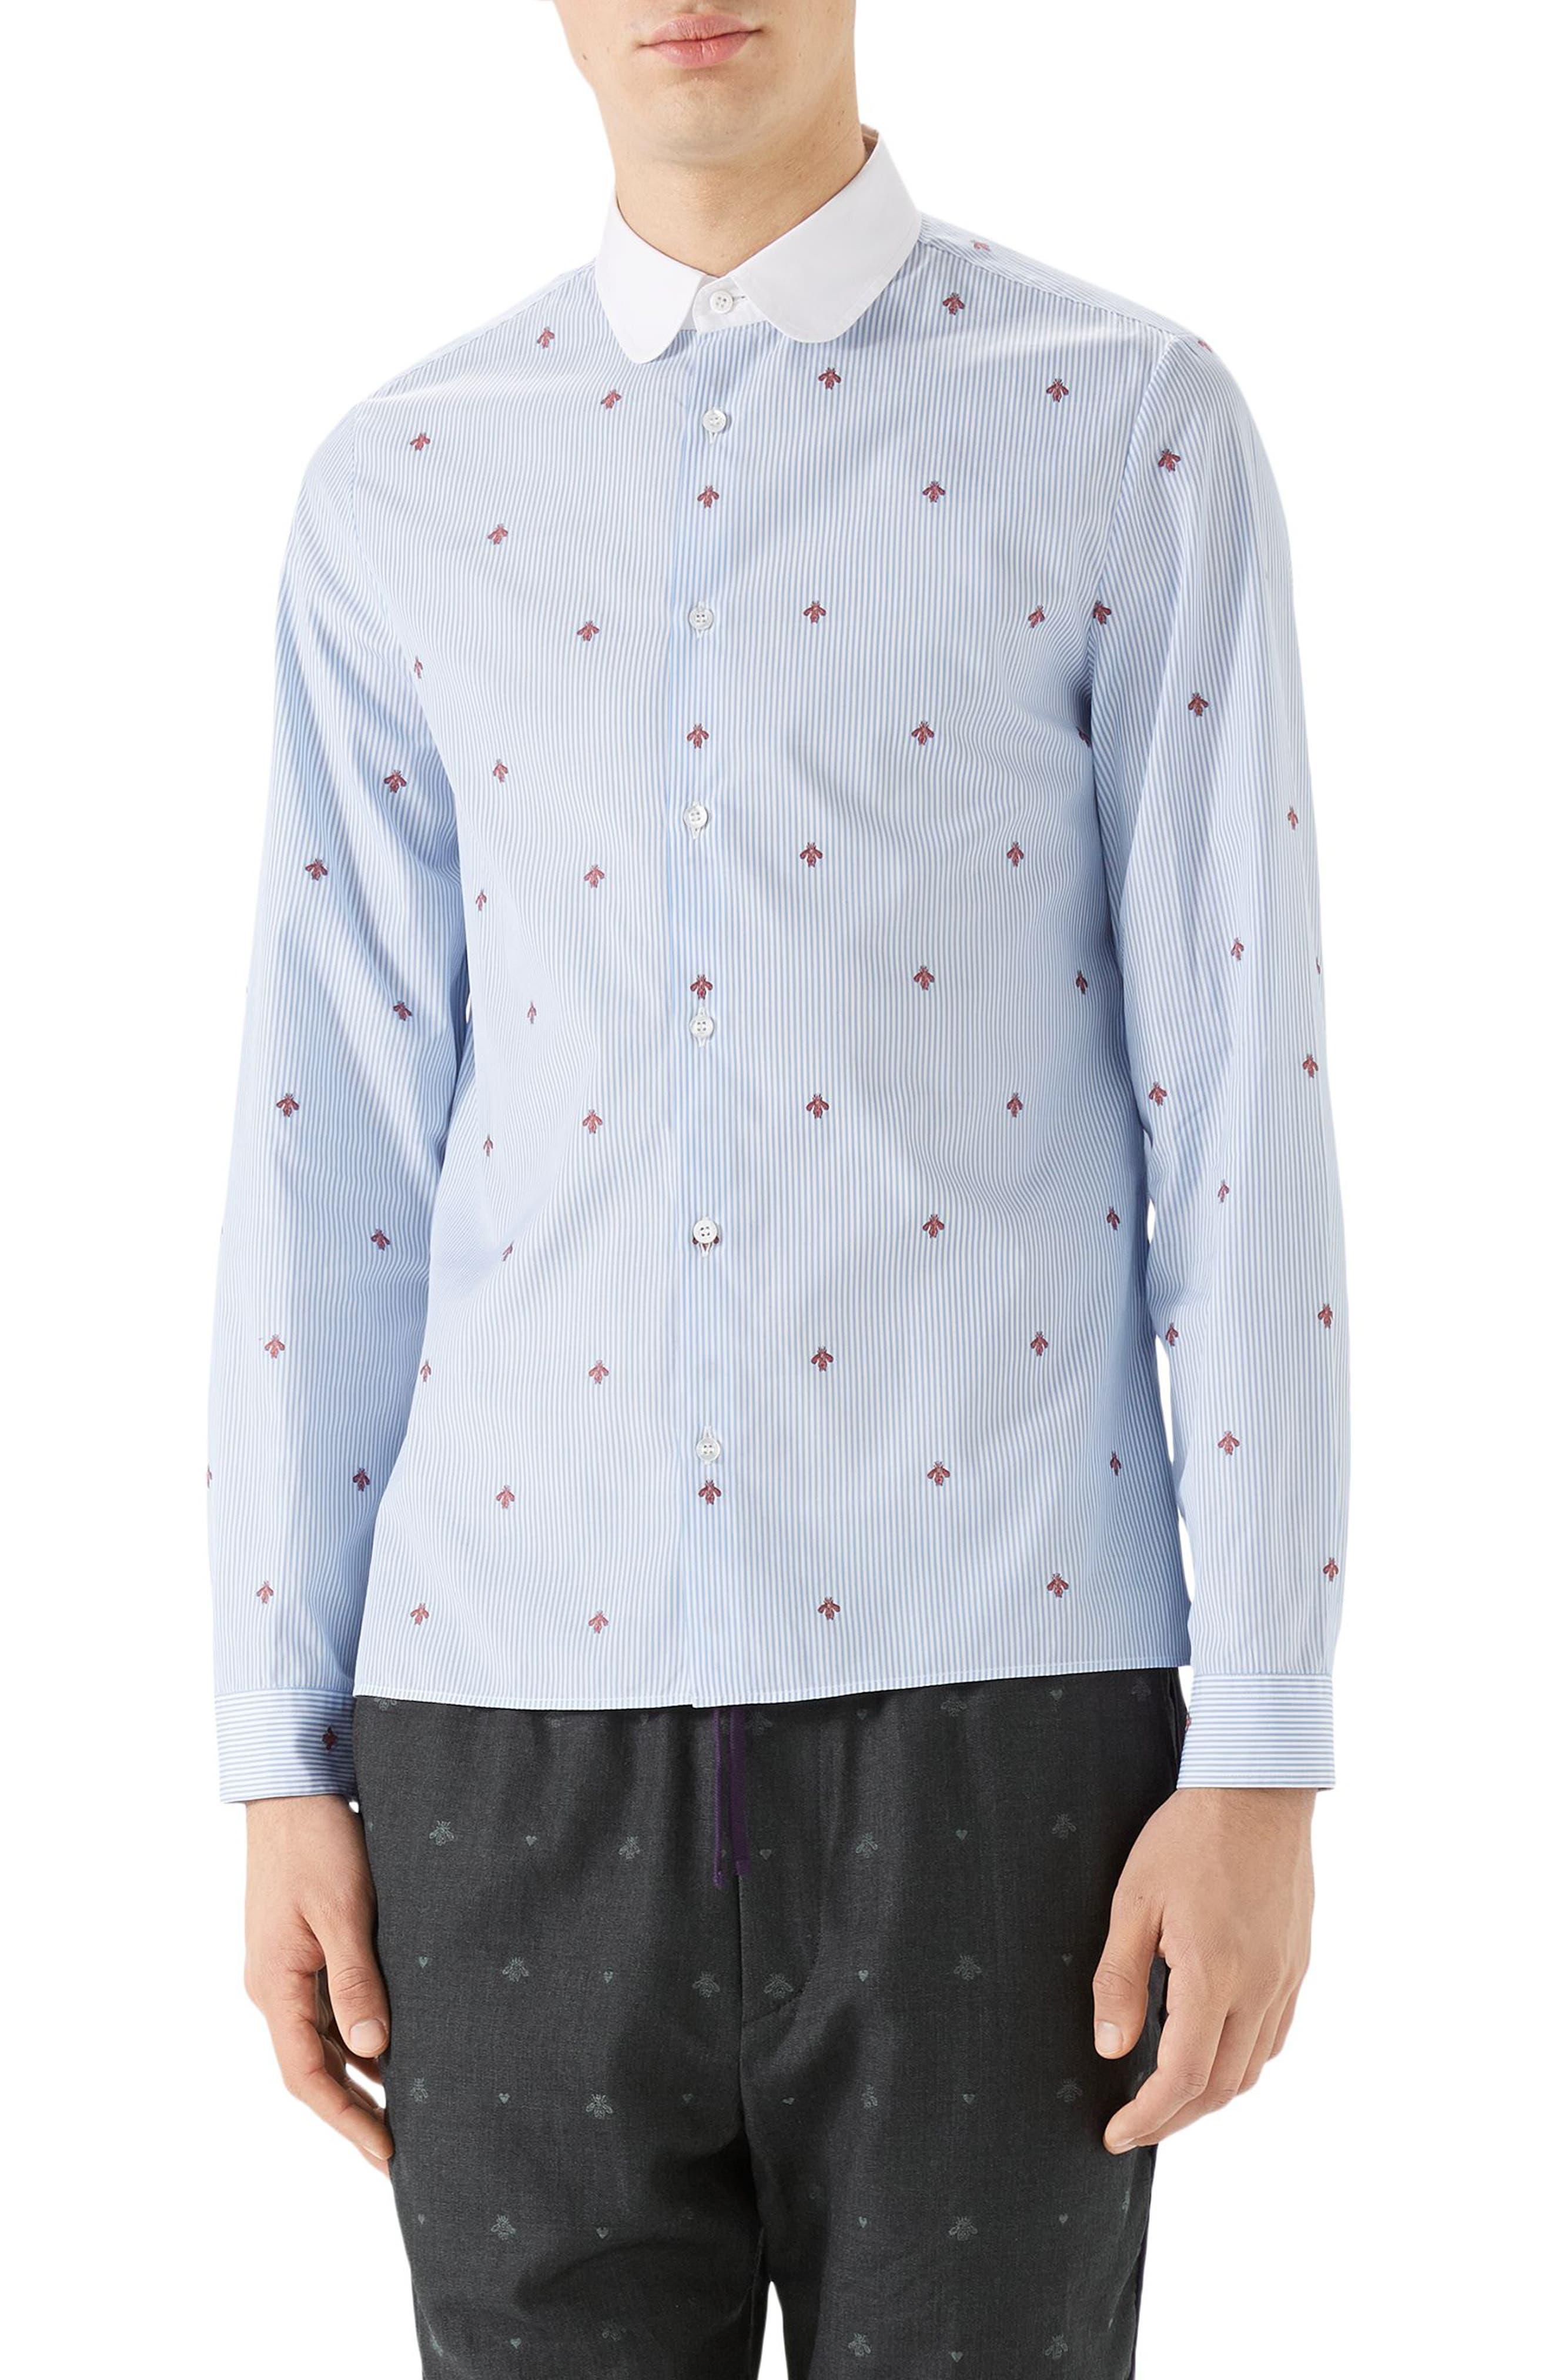 Bee Fil Coupé Sport Shirt,                         Main,                         color, Sky Blue/ White